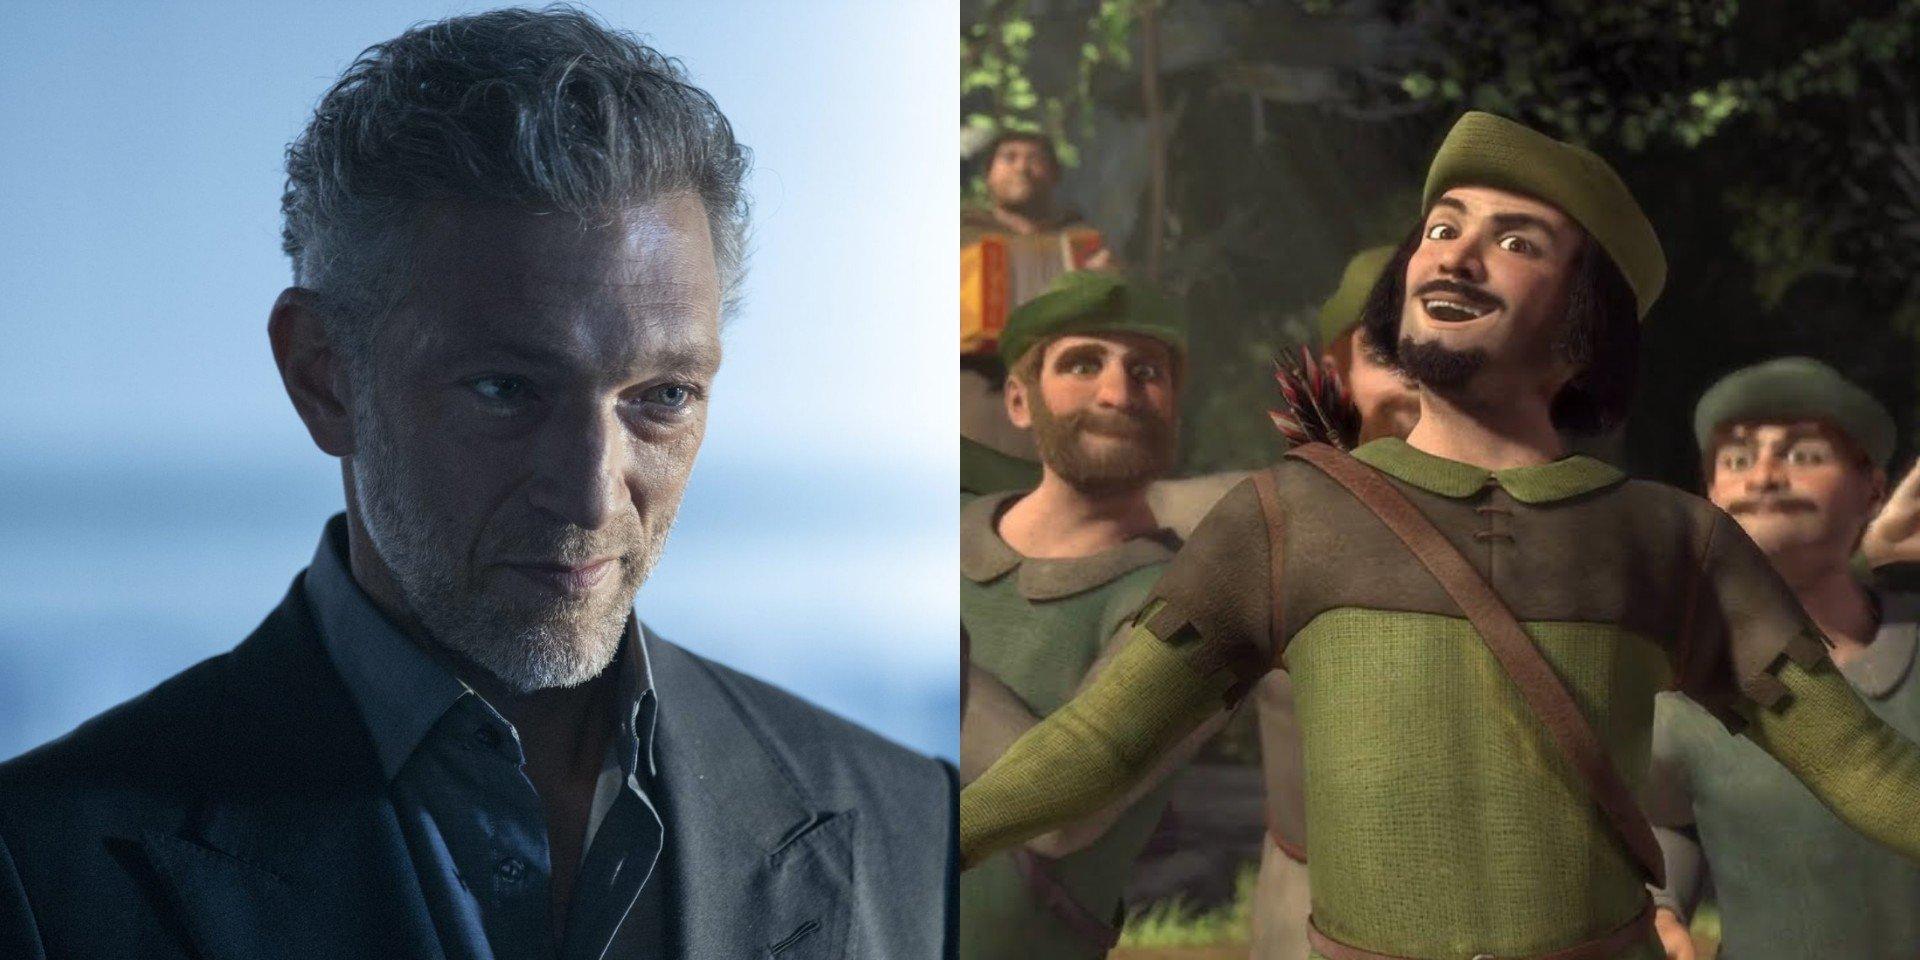 Vincent Cassell - Westworld/ Robin Hood from Shrek